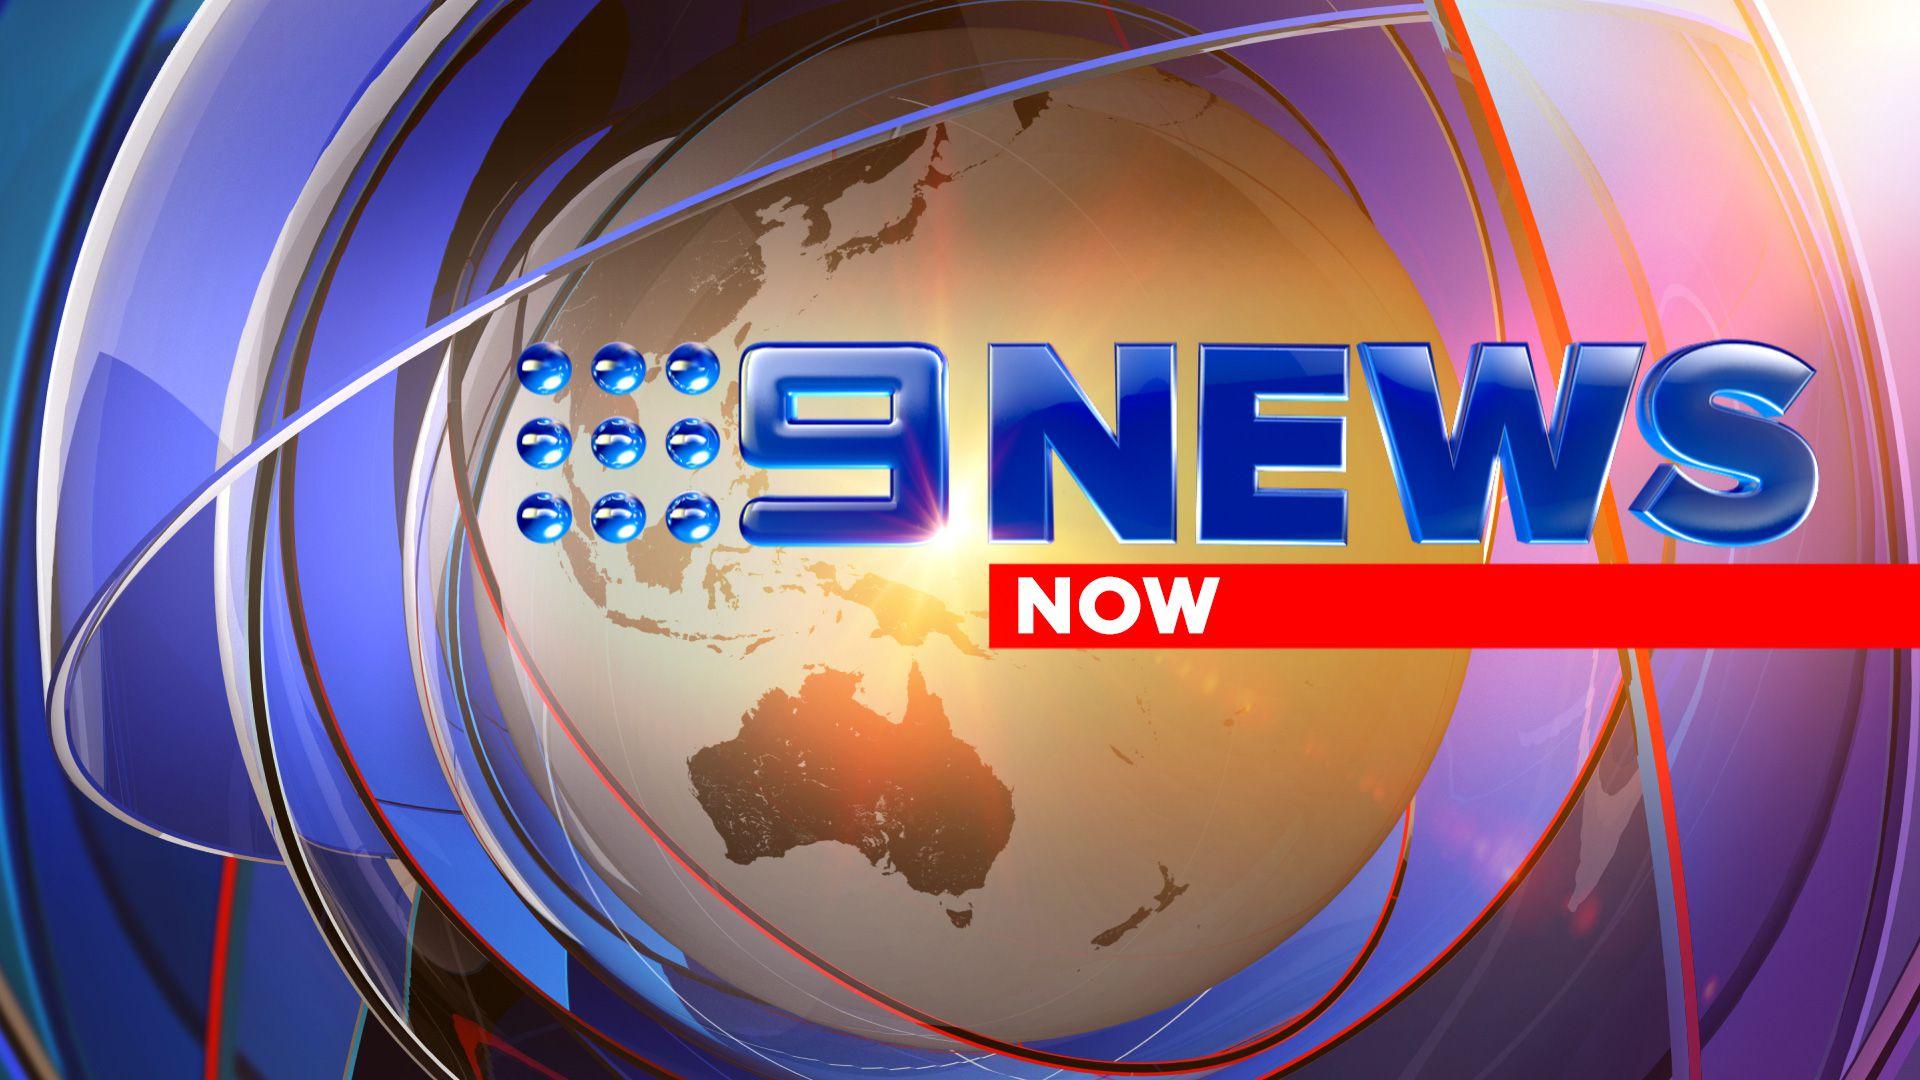 Watch Nine News Now 2019, Catch Up TV